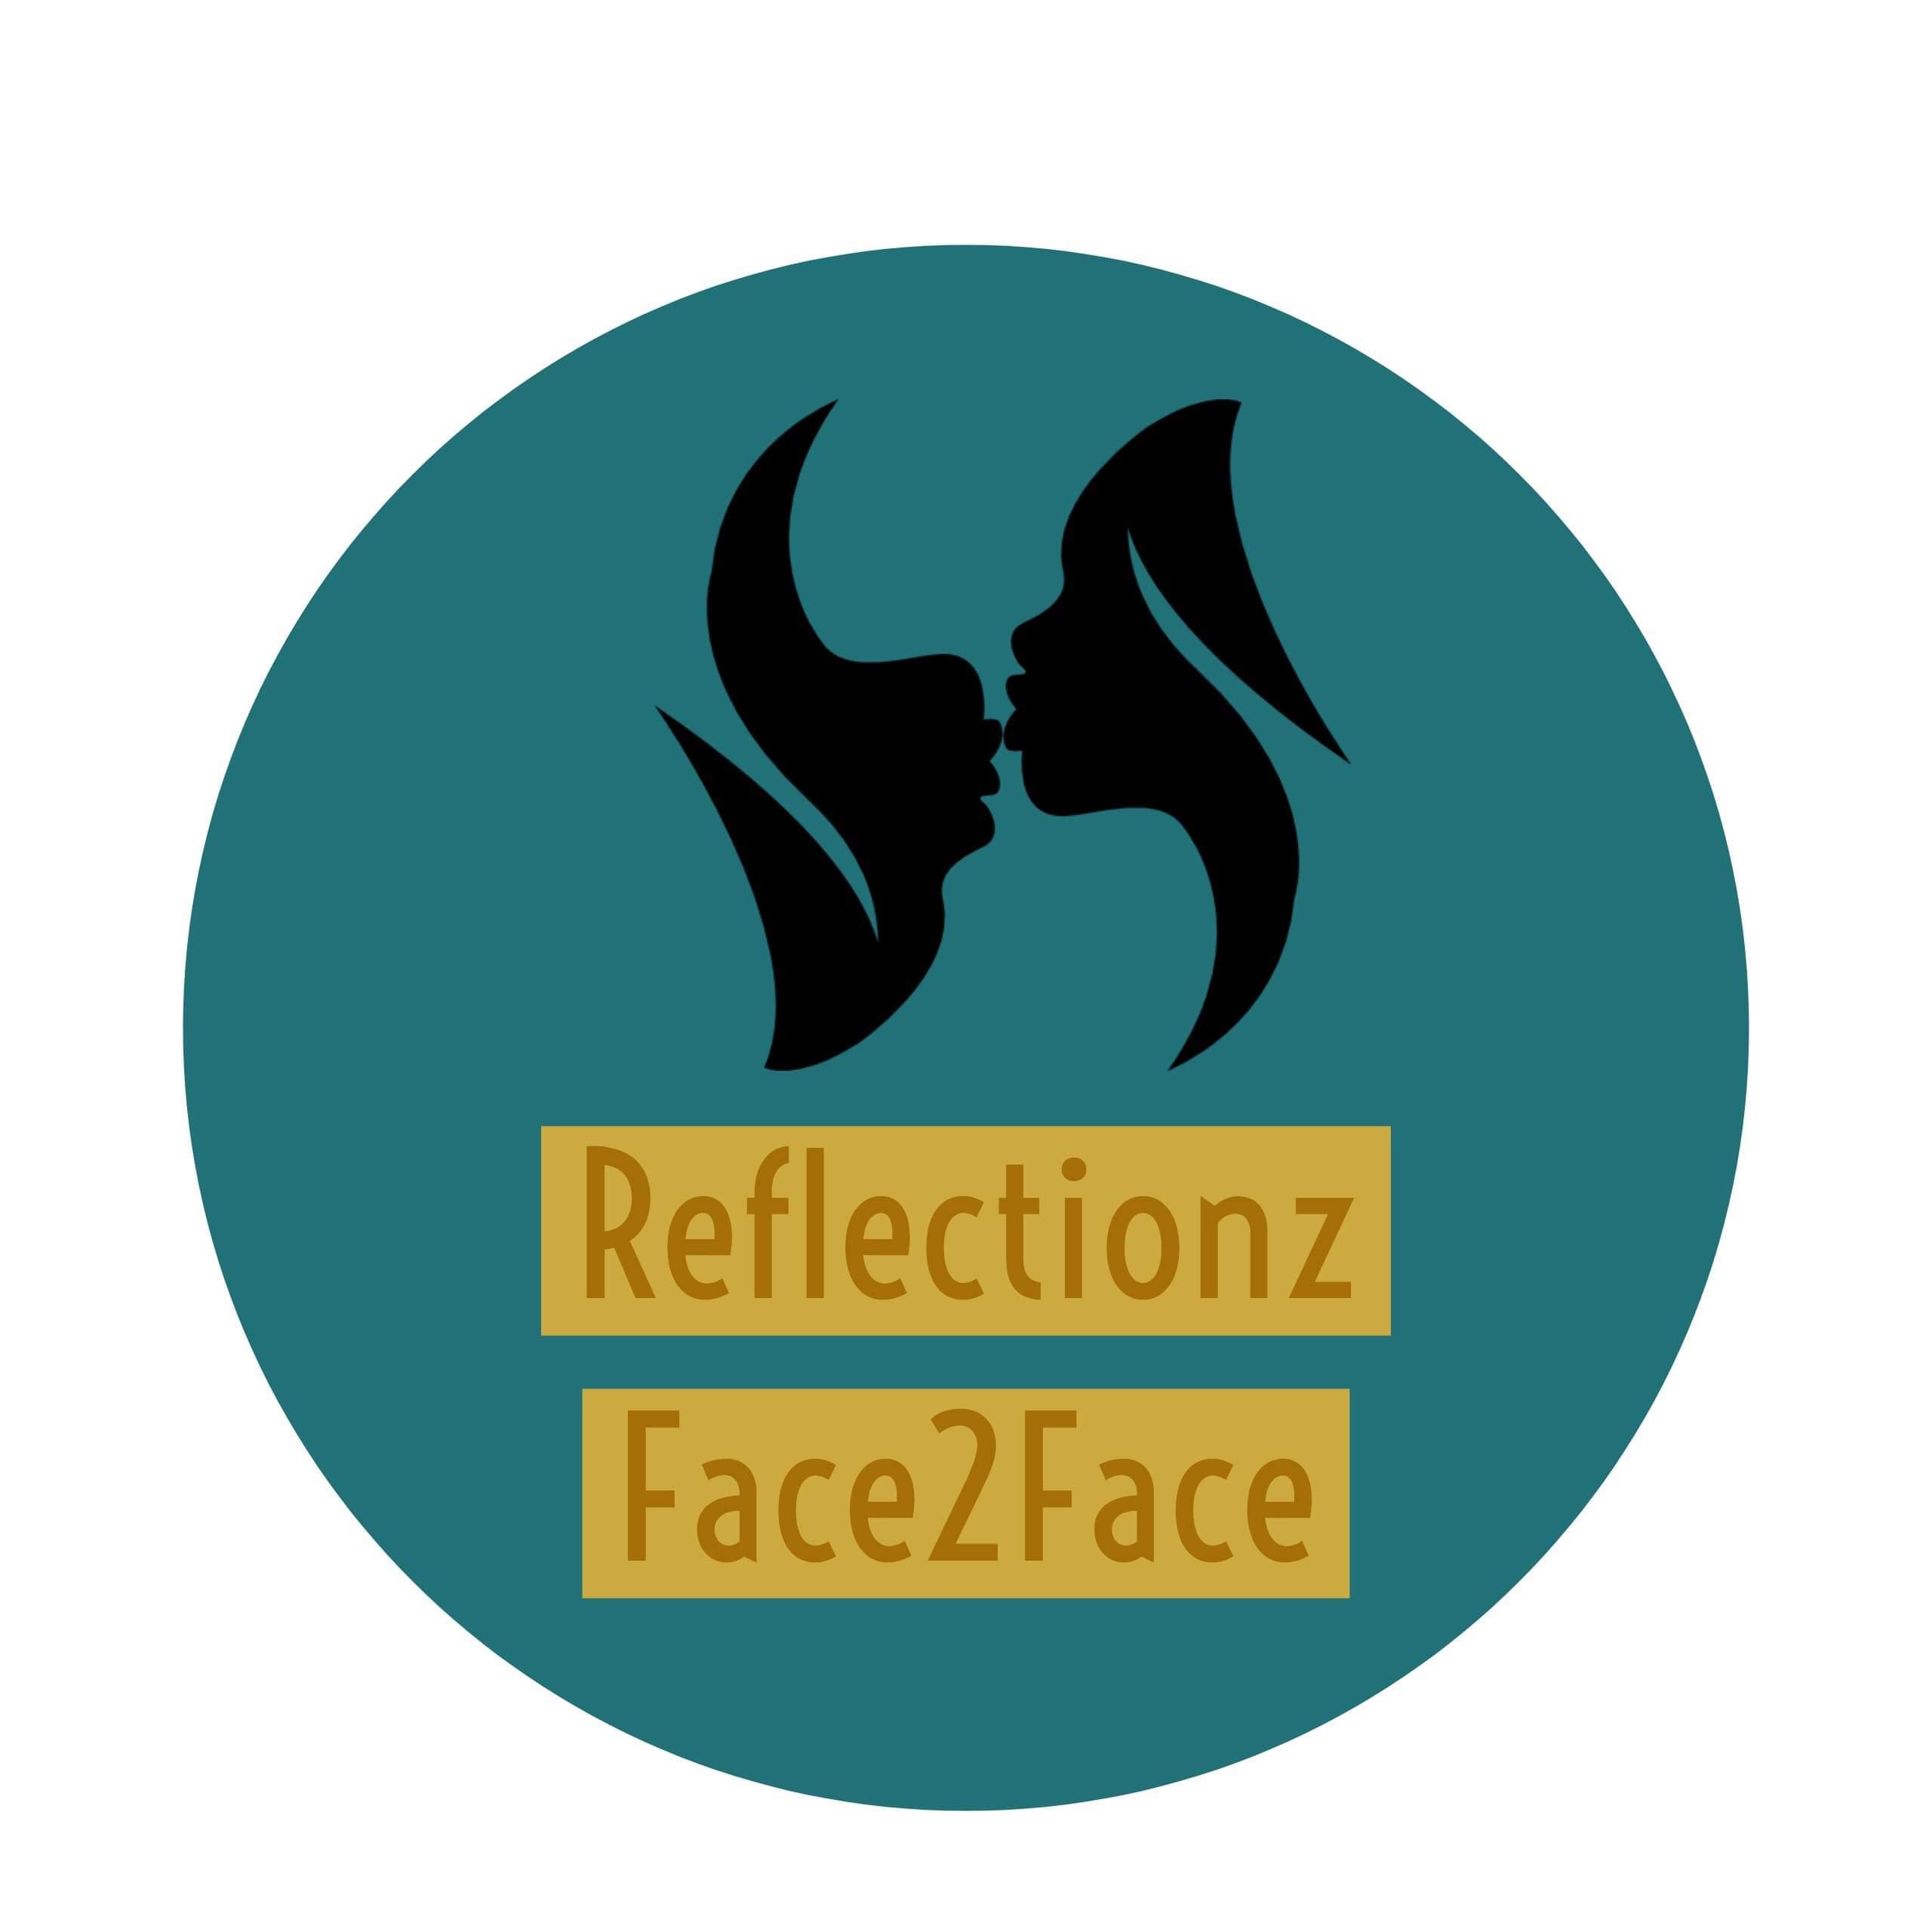 Reflection's Face2Face